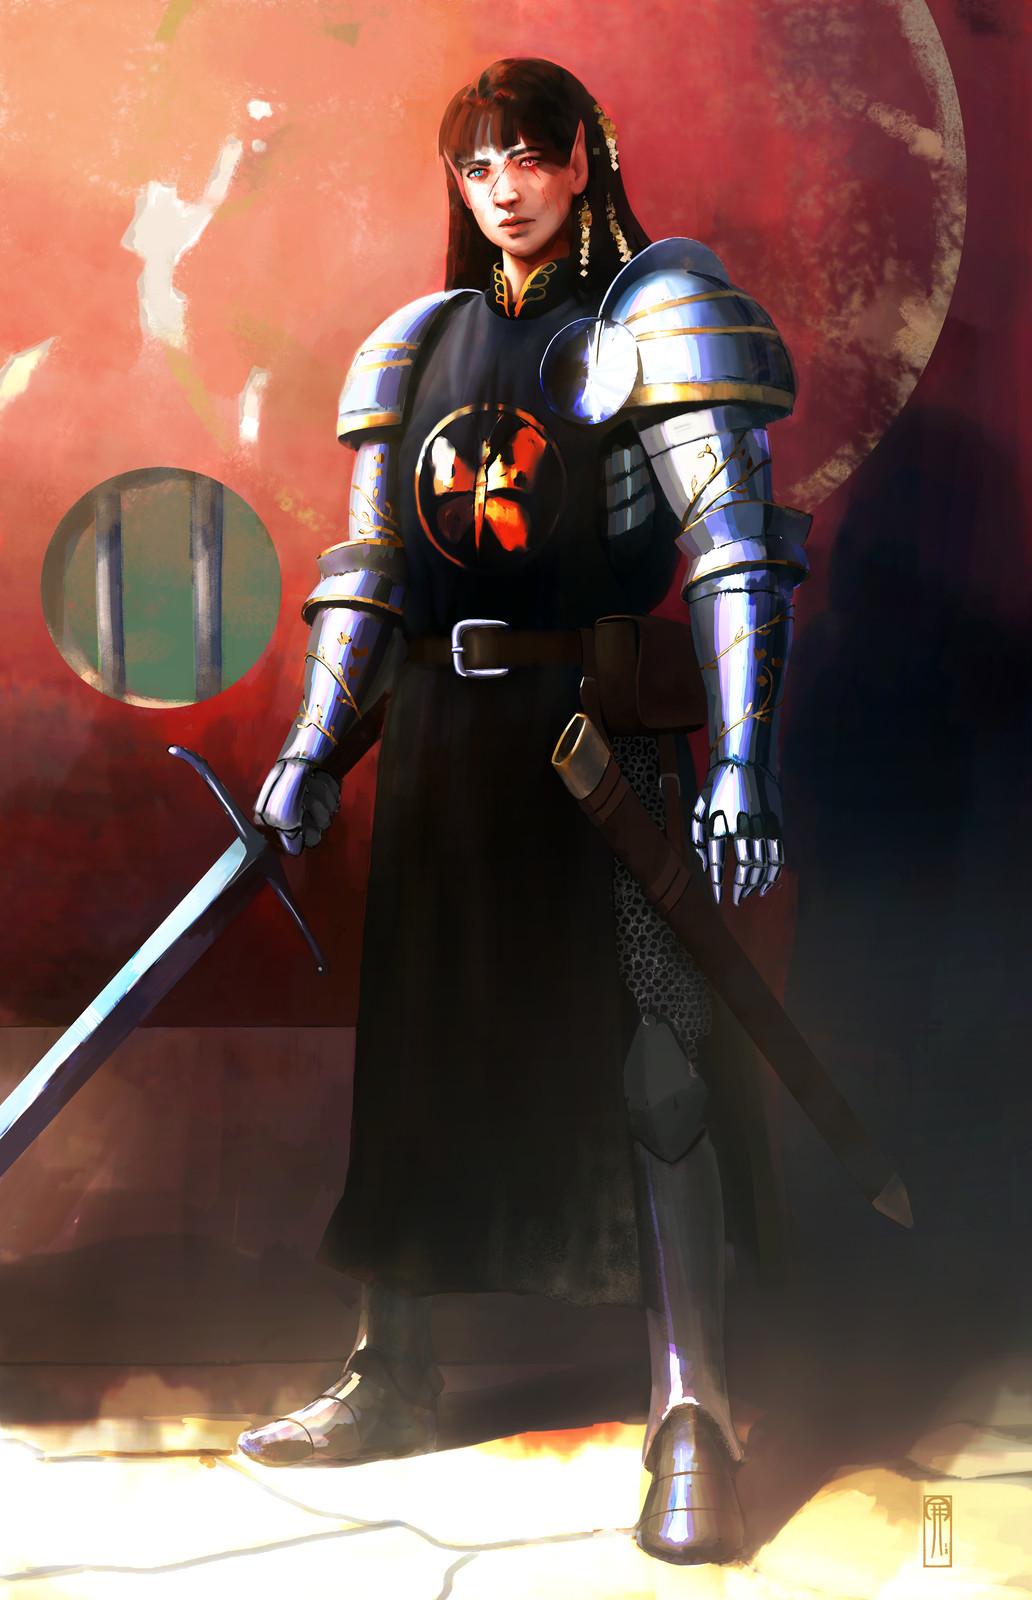 Fallen clan champion